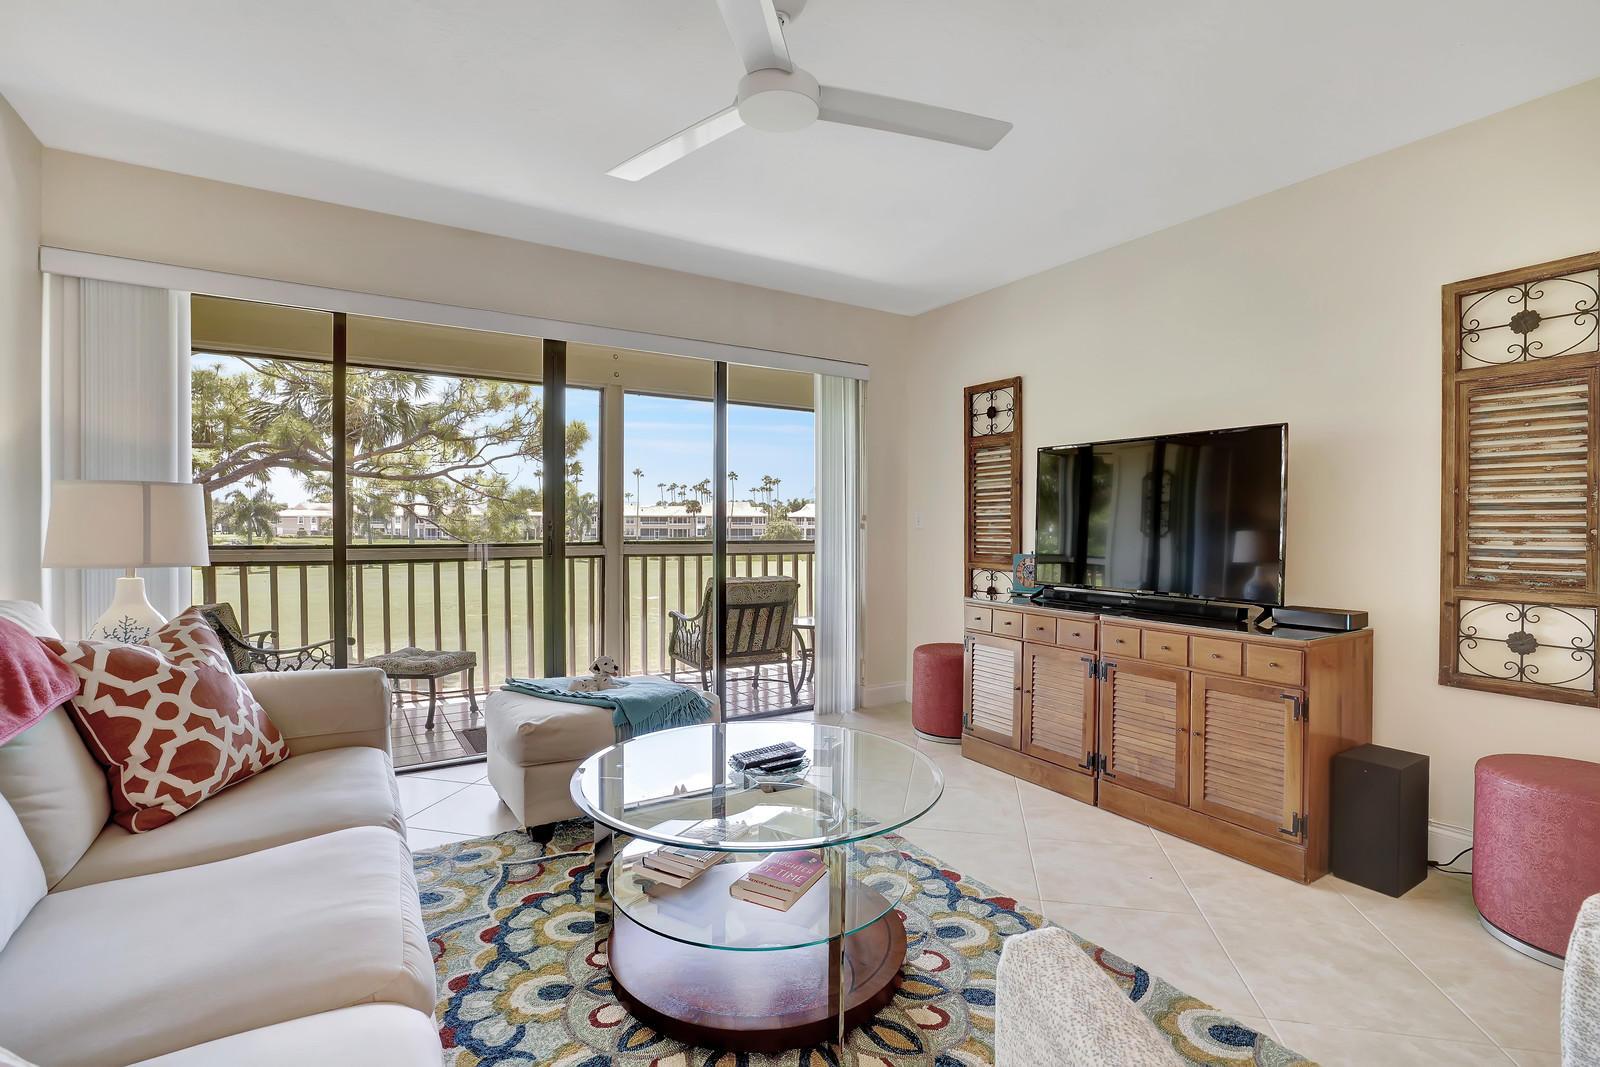 316 Brackenwood Circle, Palm Beach Gardens, Florida 33418, 2 Bedrooms Bedrooms, ,2 BathroomsBathrooms,F,Condominium,Brackenwood,RX-10588801